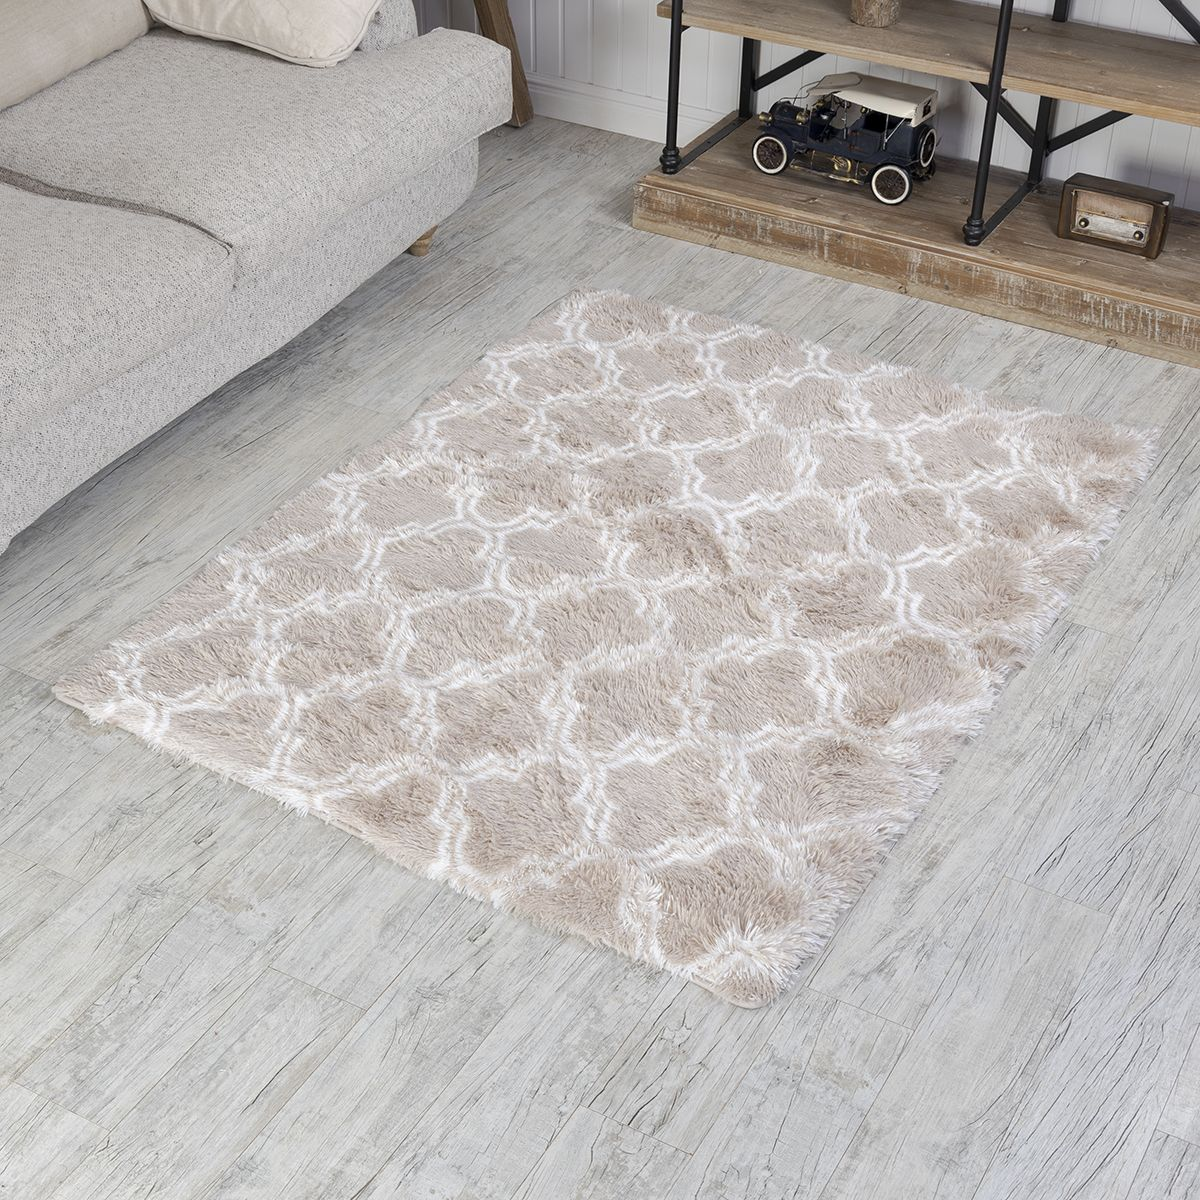 سجادة أرضية فرو بيج 120 160 سم Home Decor Decor Carpet